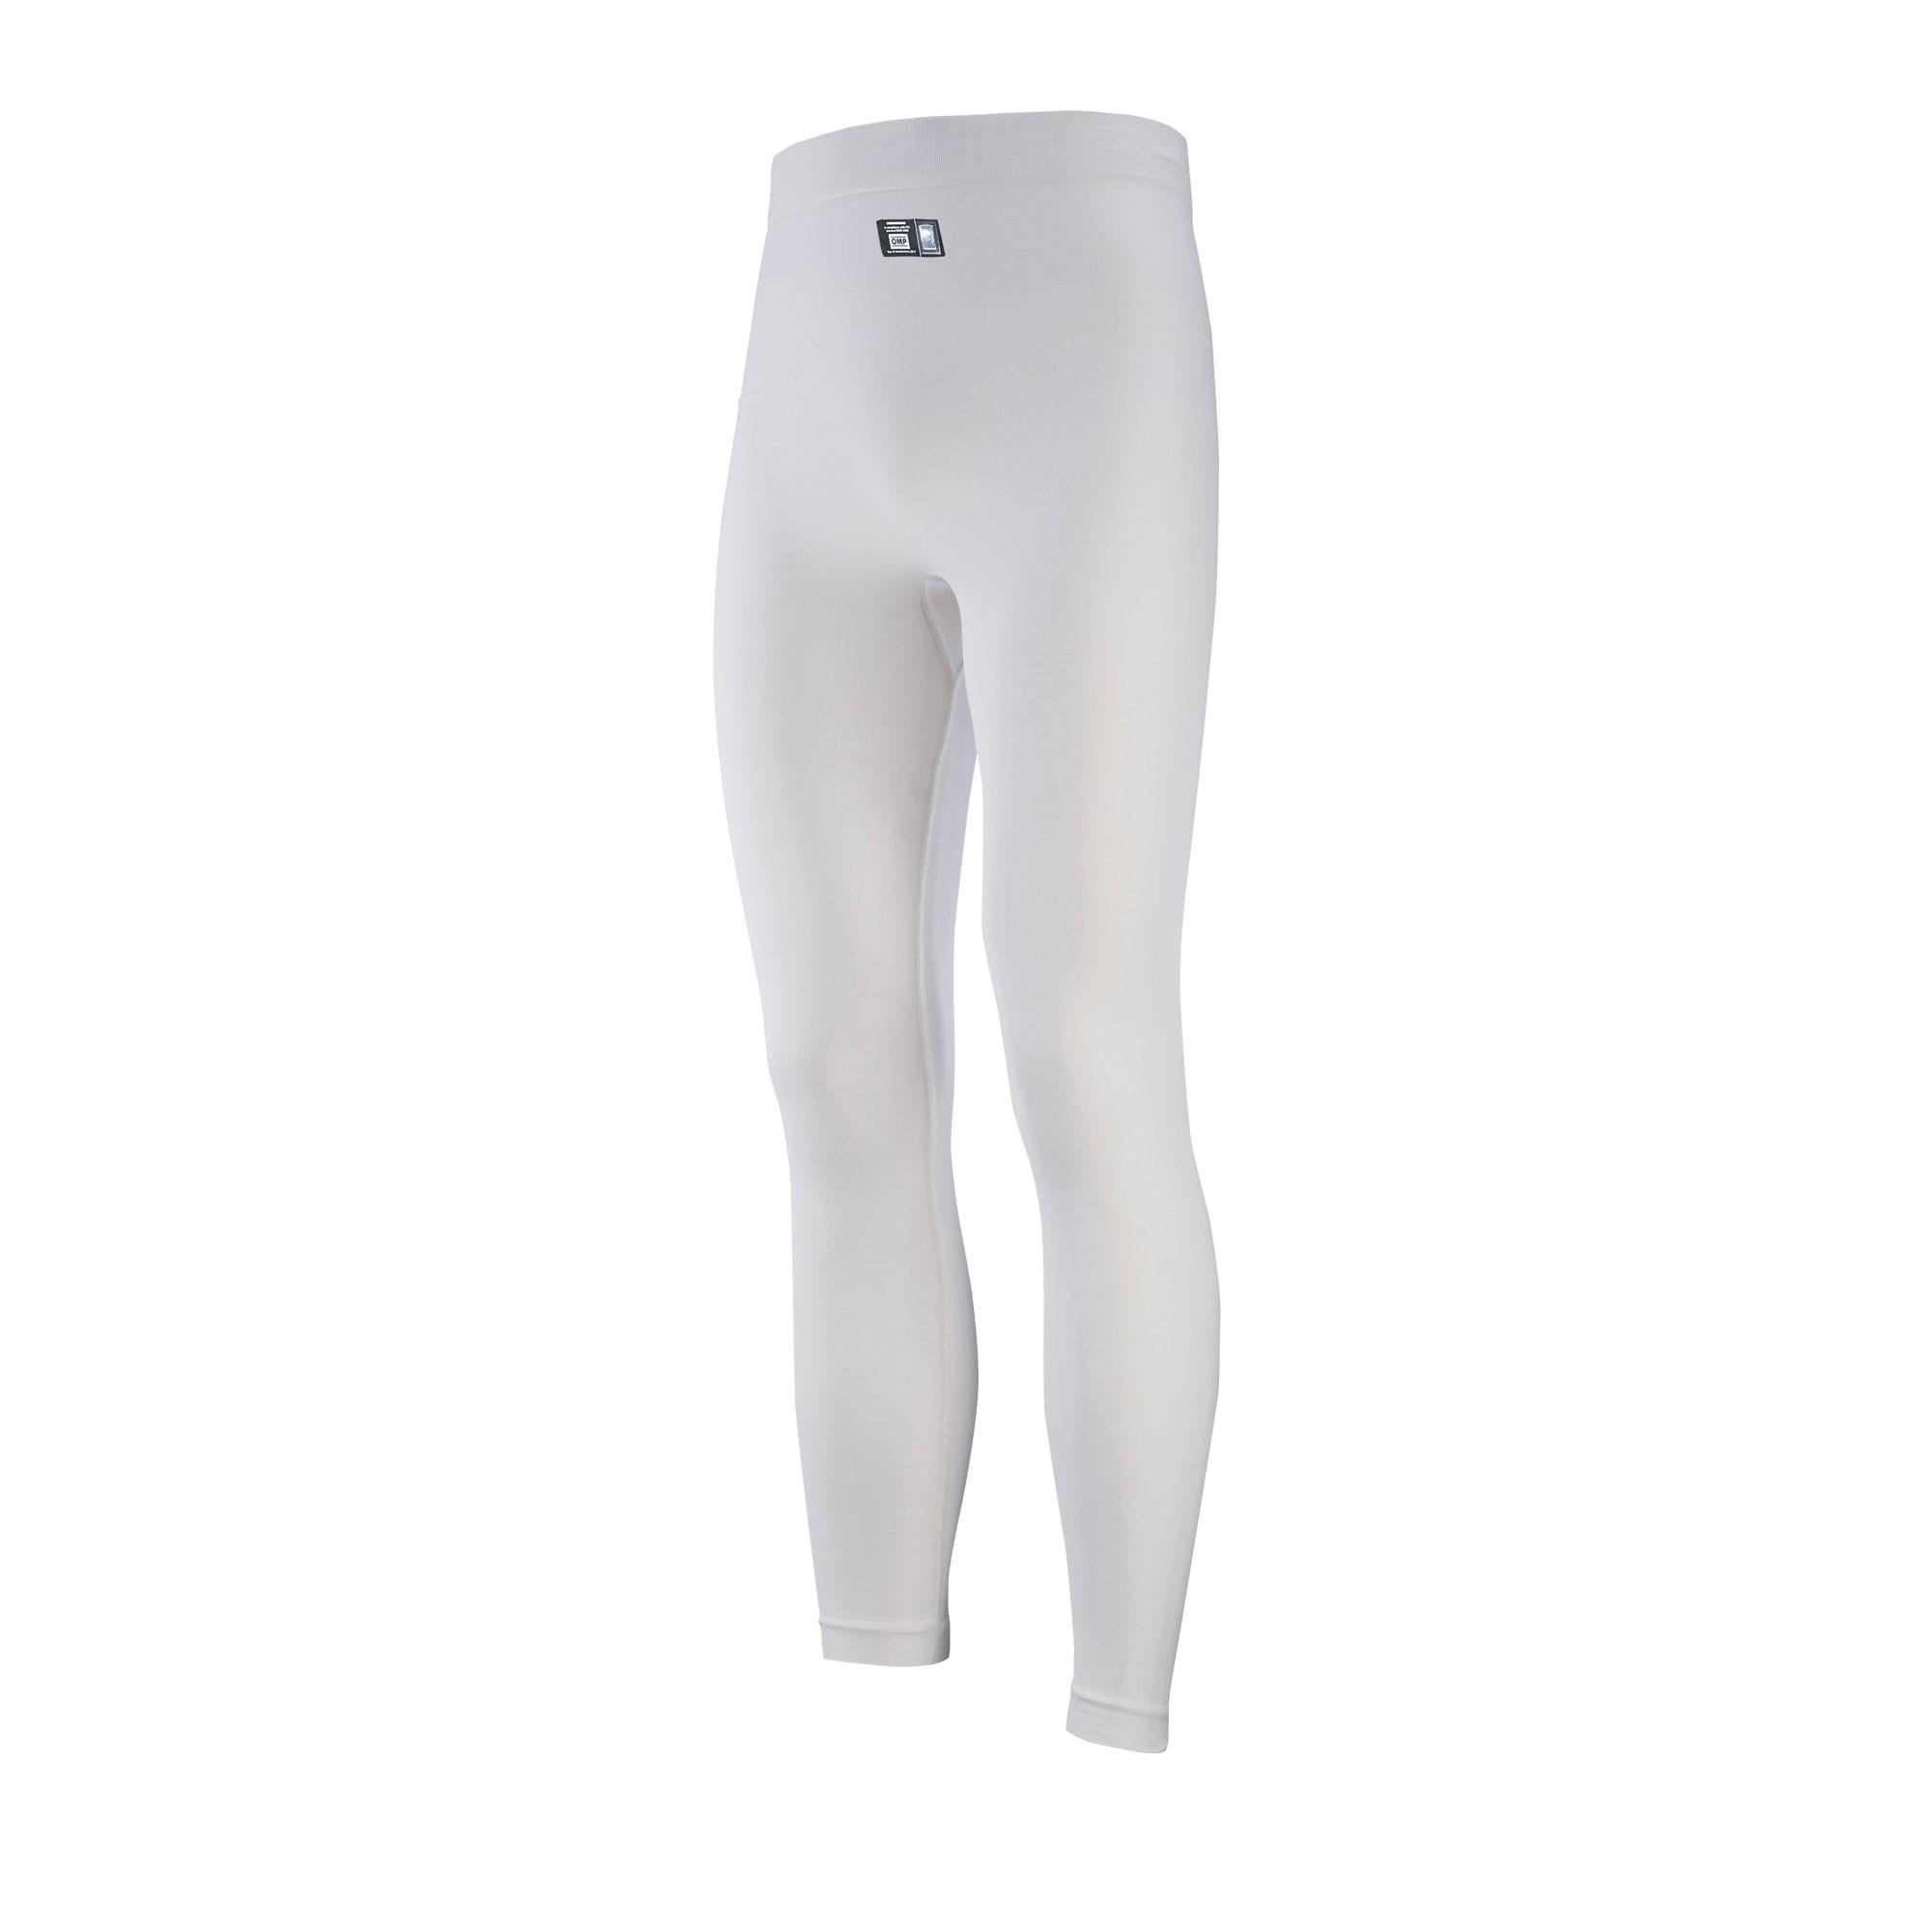 Racing underwear - ONE LONG JOHNS - WHITE VERSION